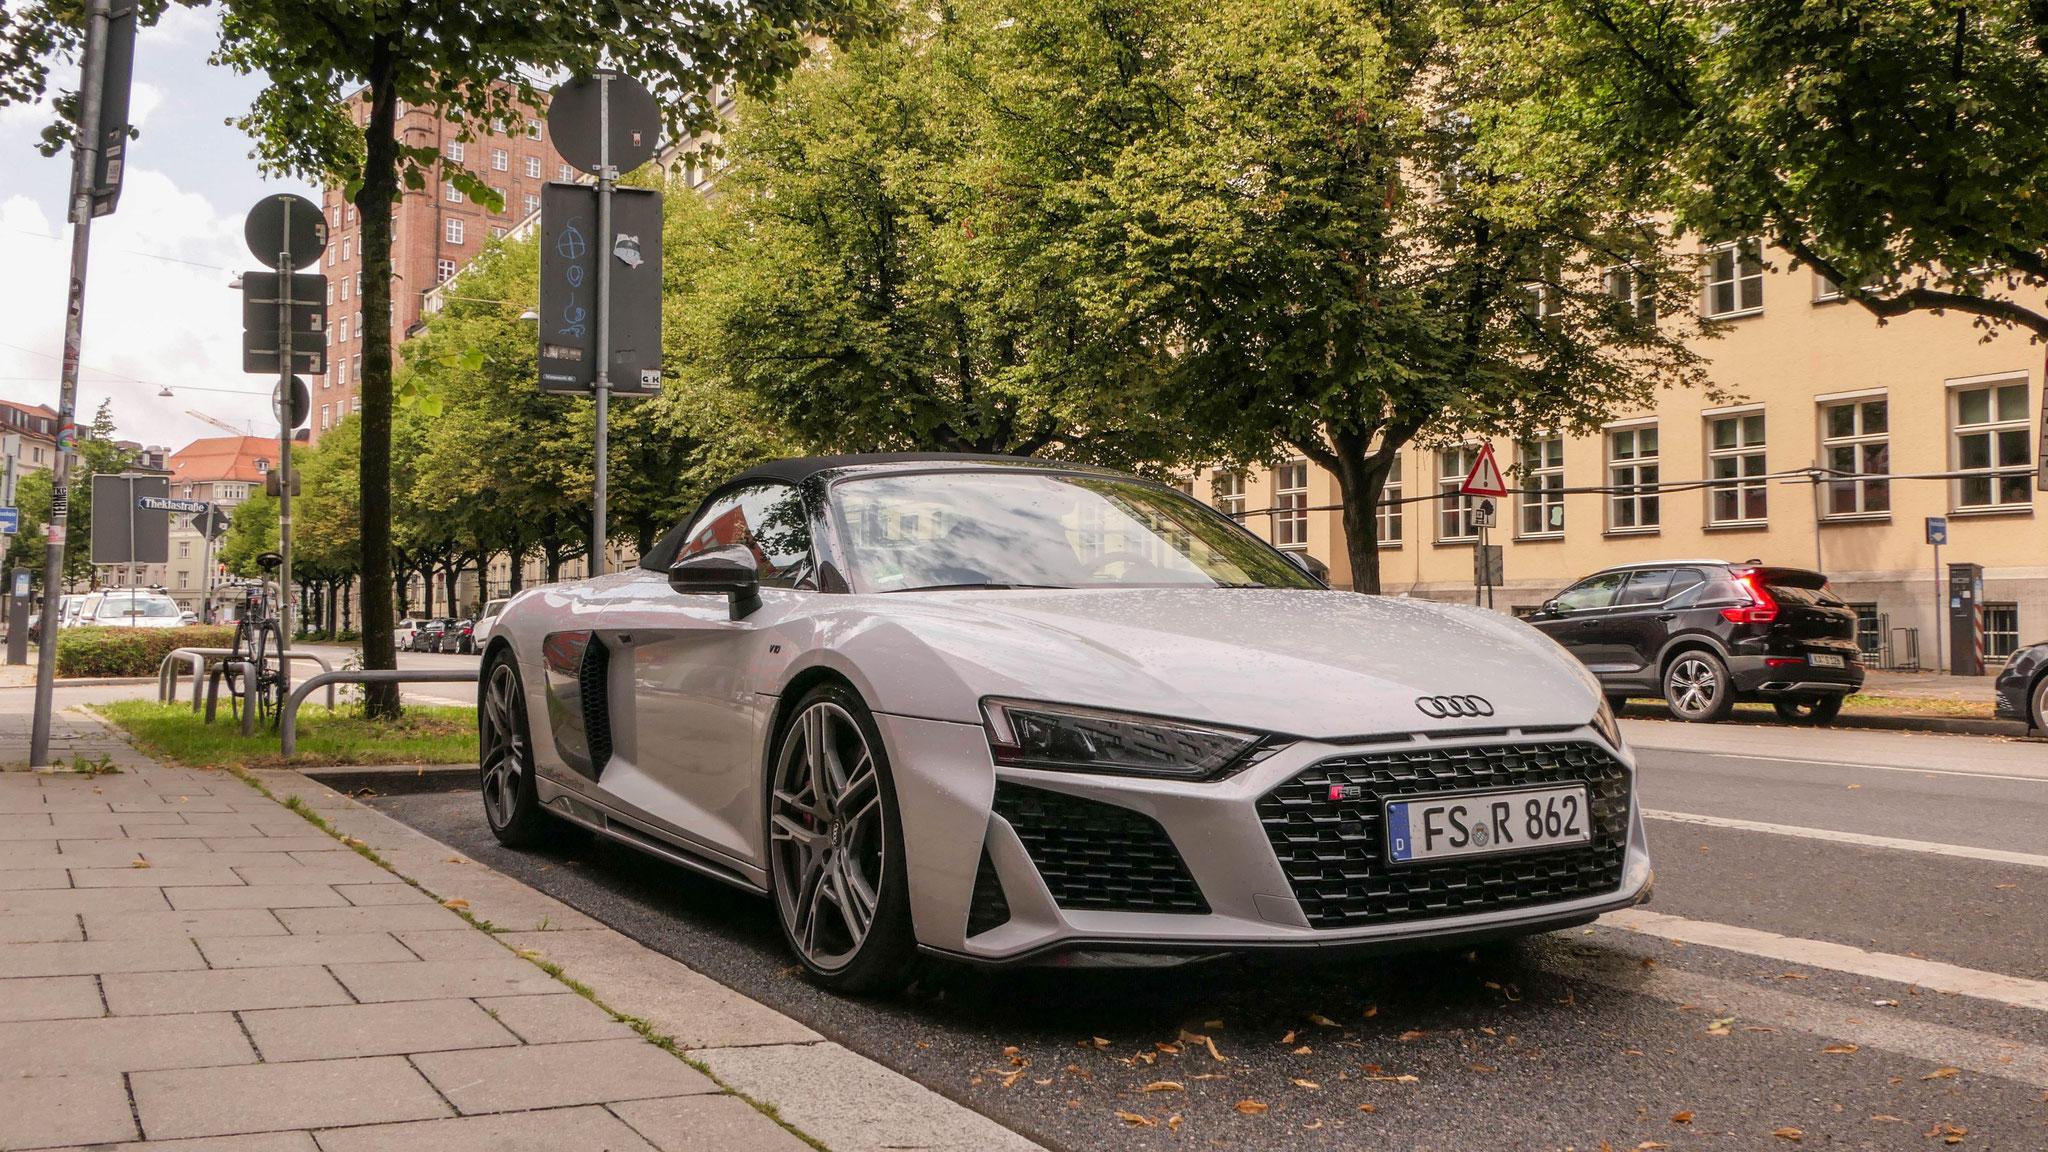 Audi R8 V10 Spyder - FS-R-862